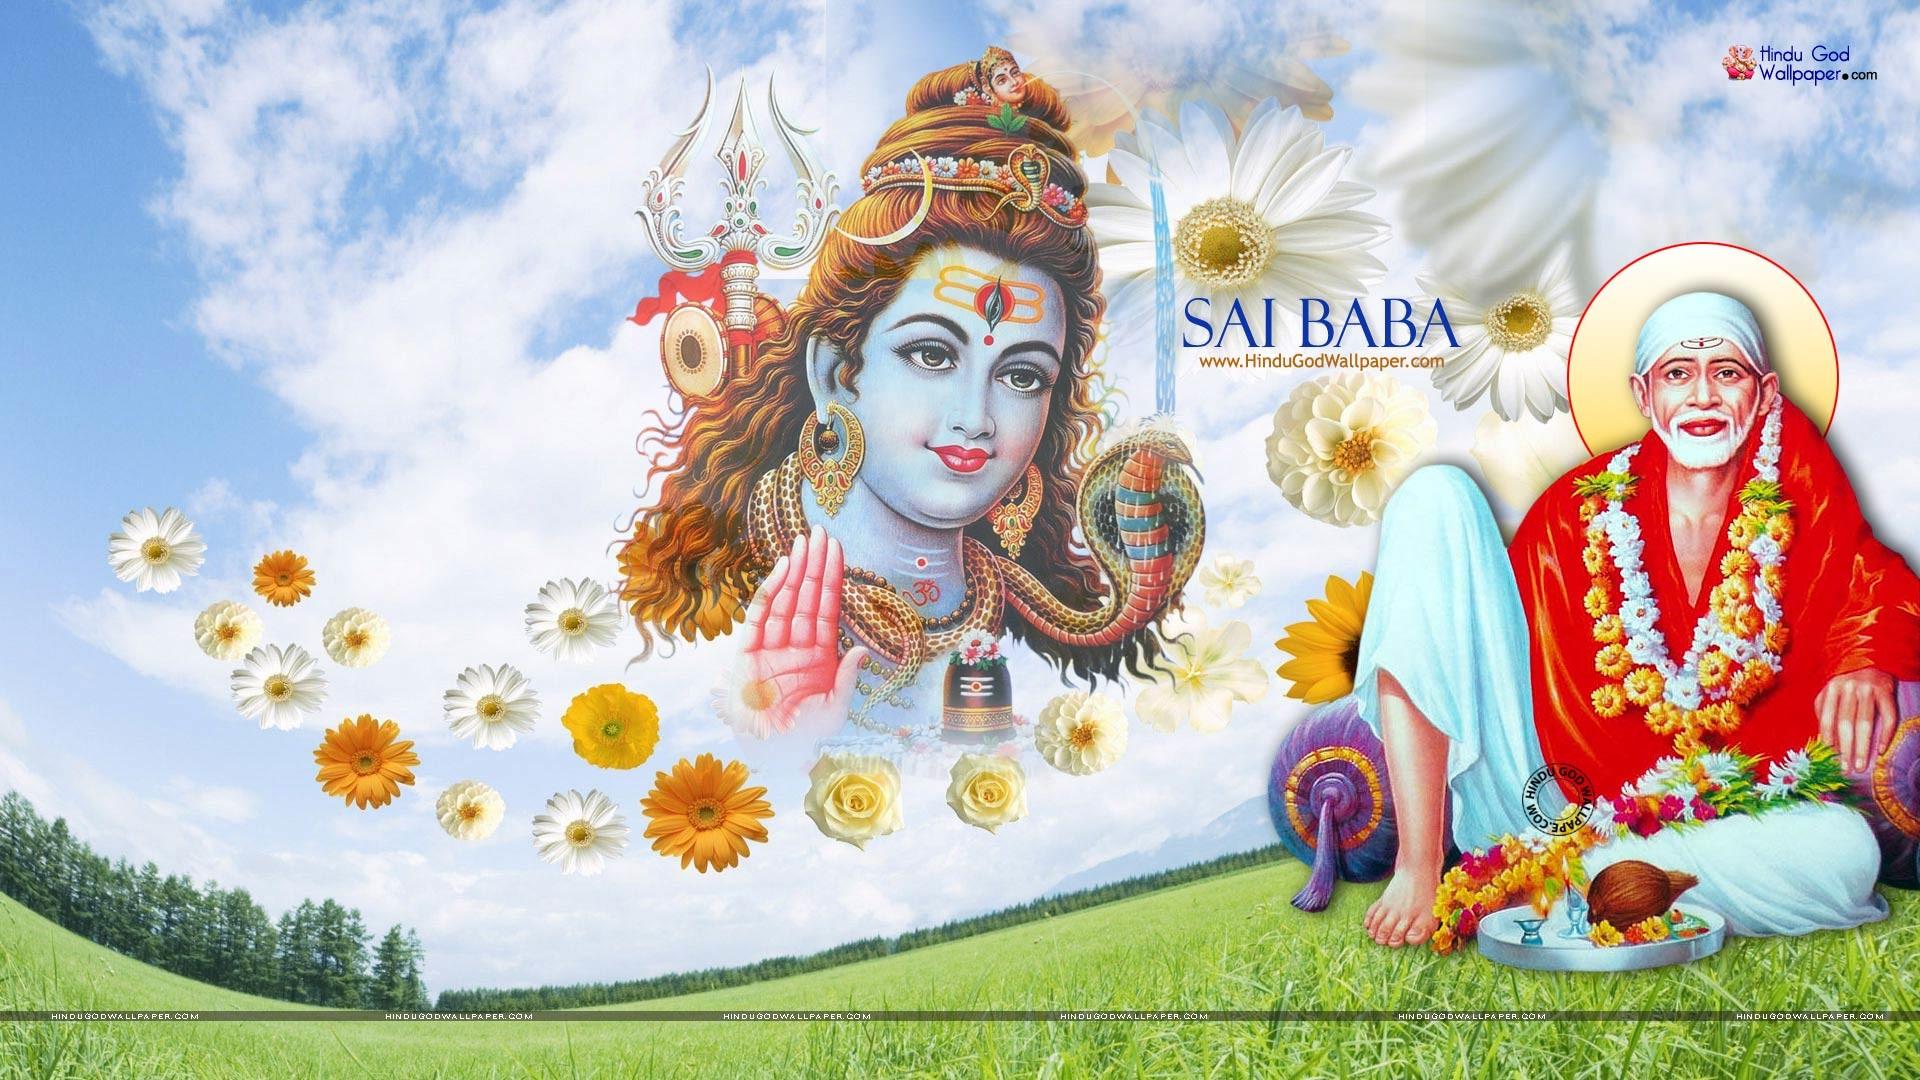 Download Sai Baba Wallpapers – Sai Baba Wallpapers, Sai Wallpaper, Shirdi  Sai Baba, Sathya Sai Wallpapers. | Sai Baba Wallpapers | Pinterest | Sai  baba